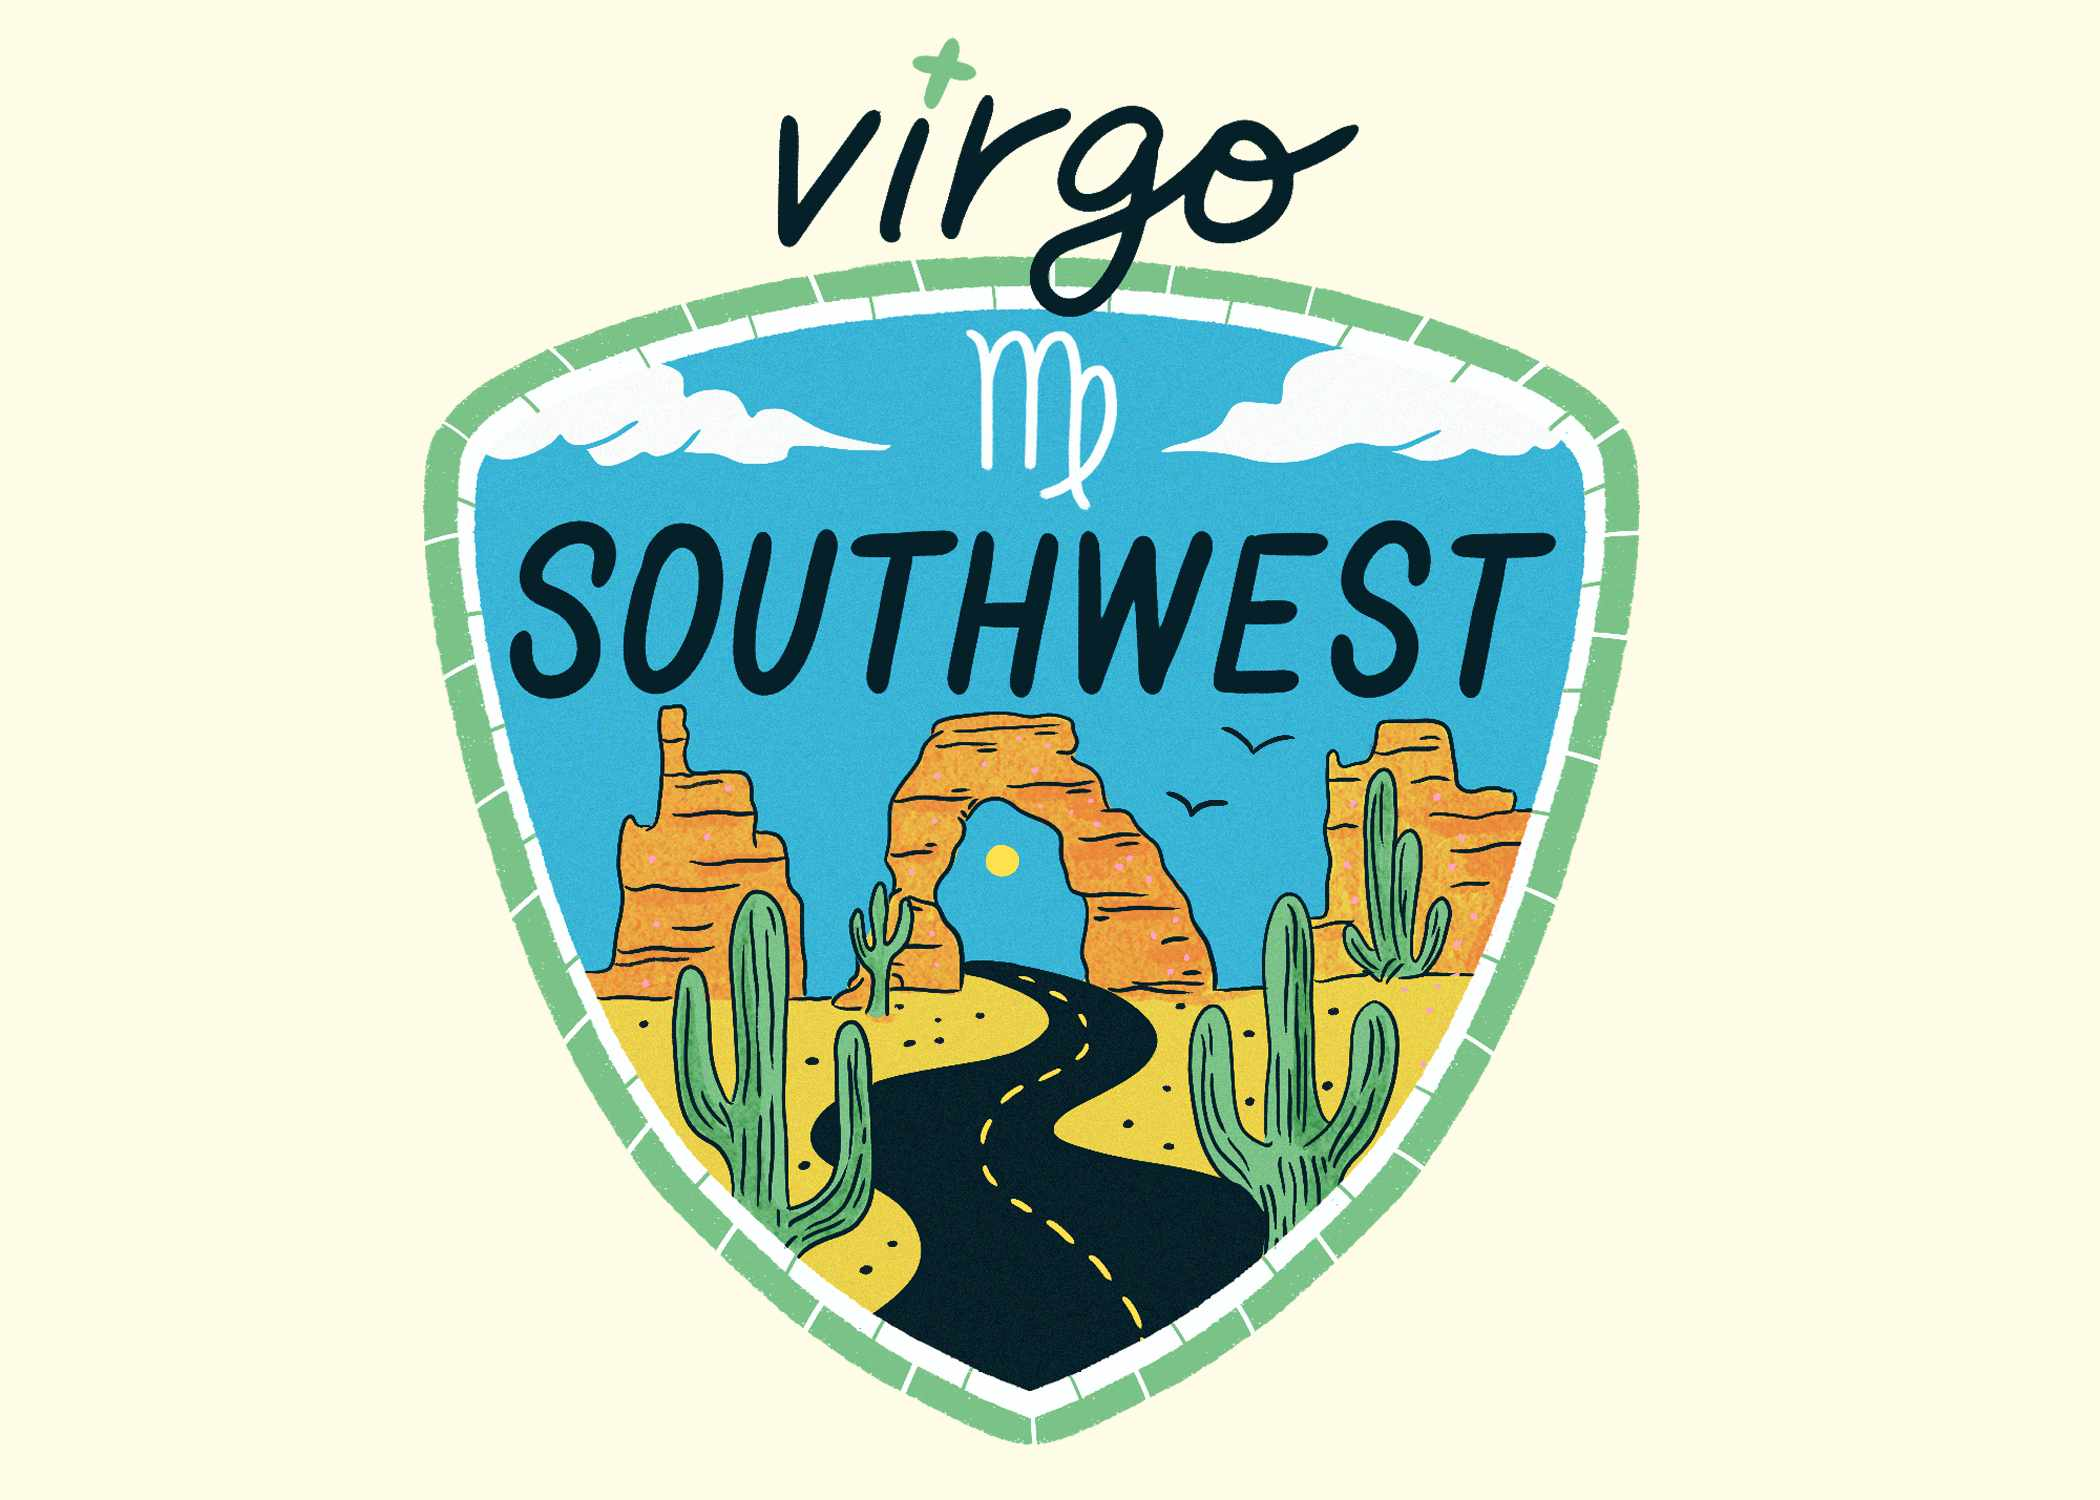 An illustration of the Southwest for Virgo